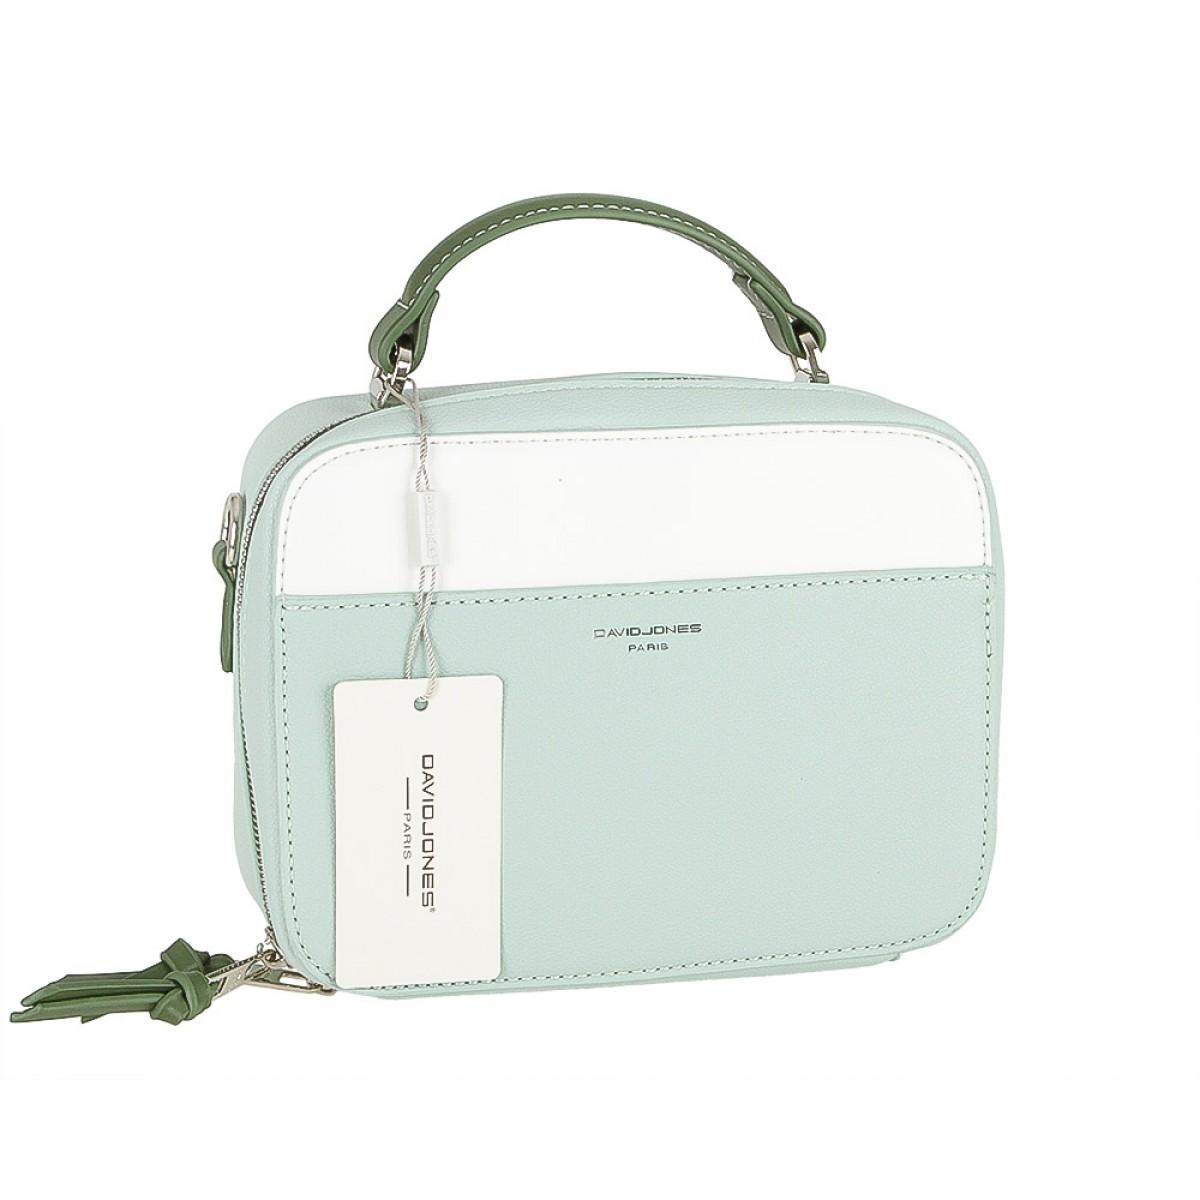 Жіноча сумка David Jones 5916-2 PALE GREEN